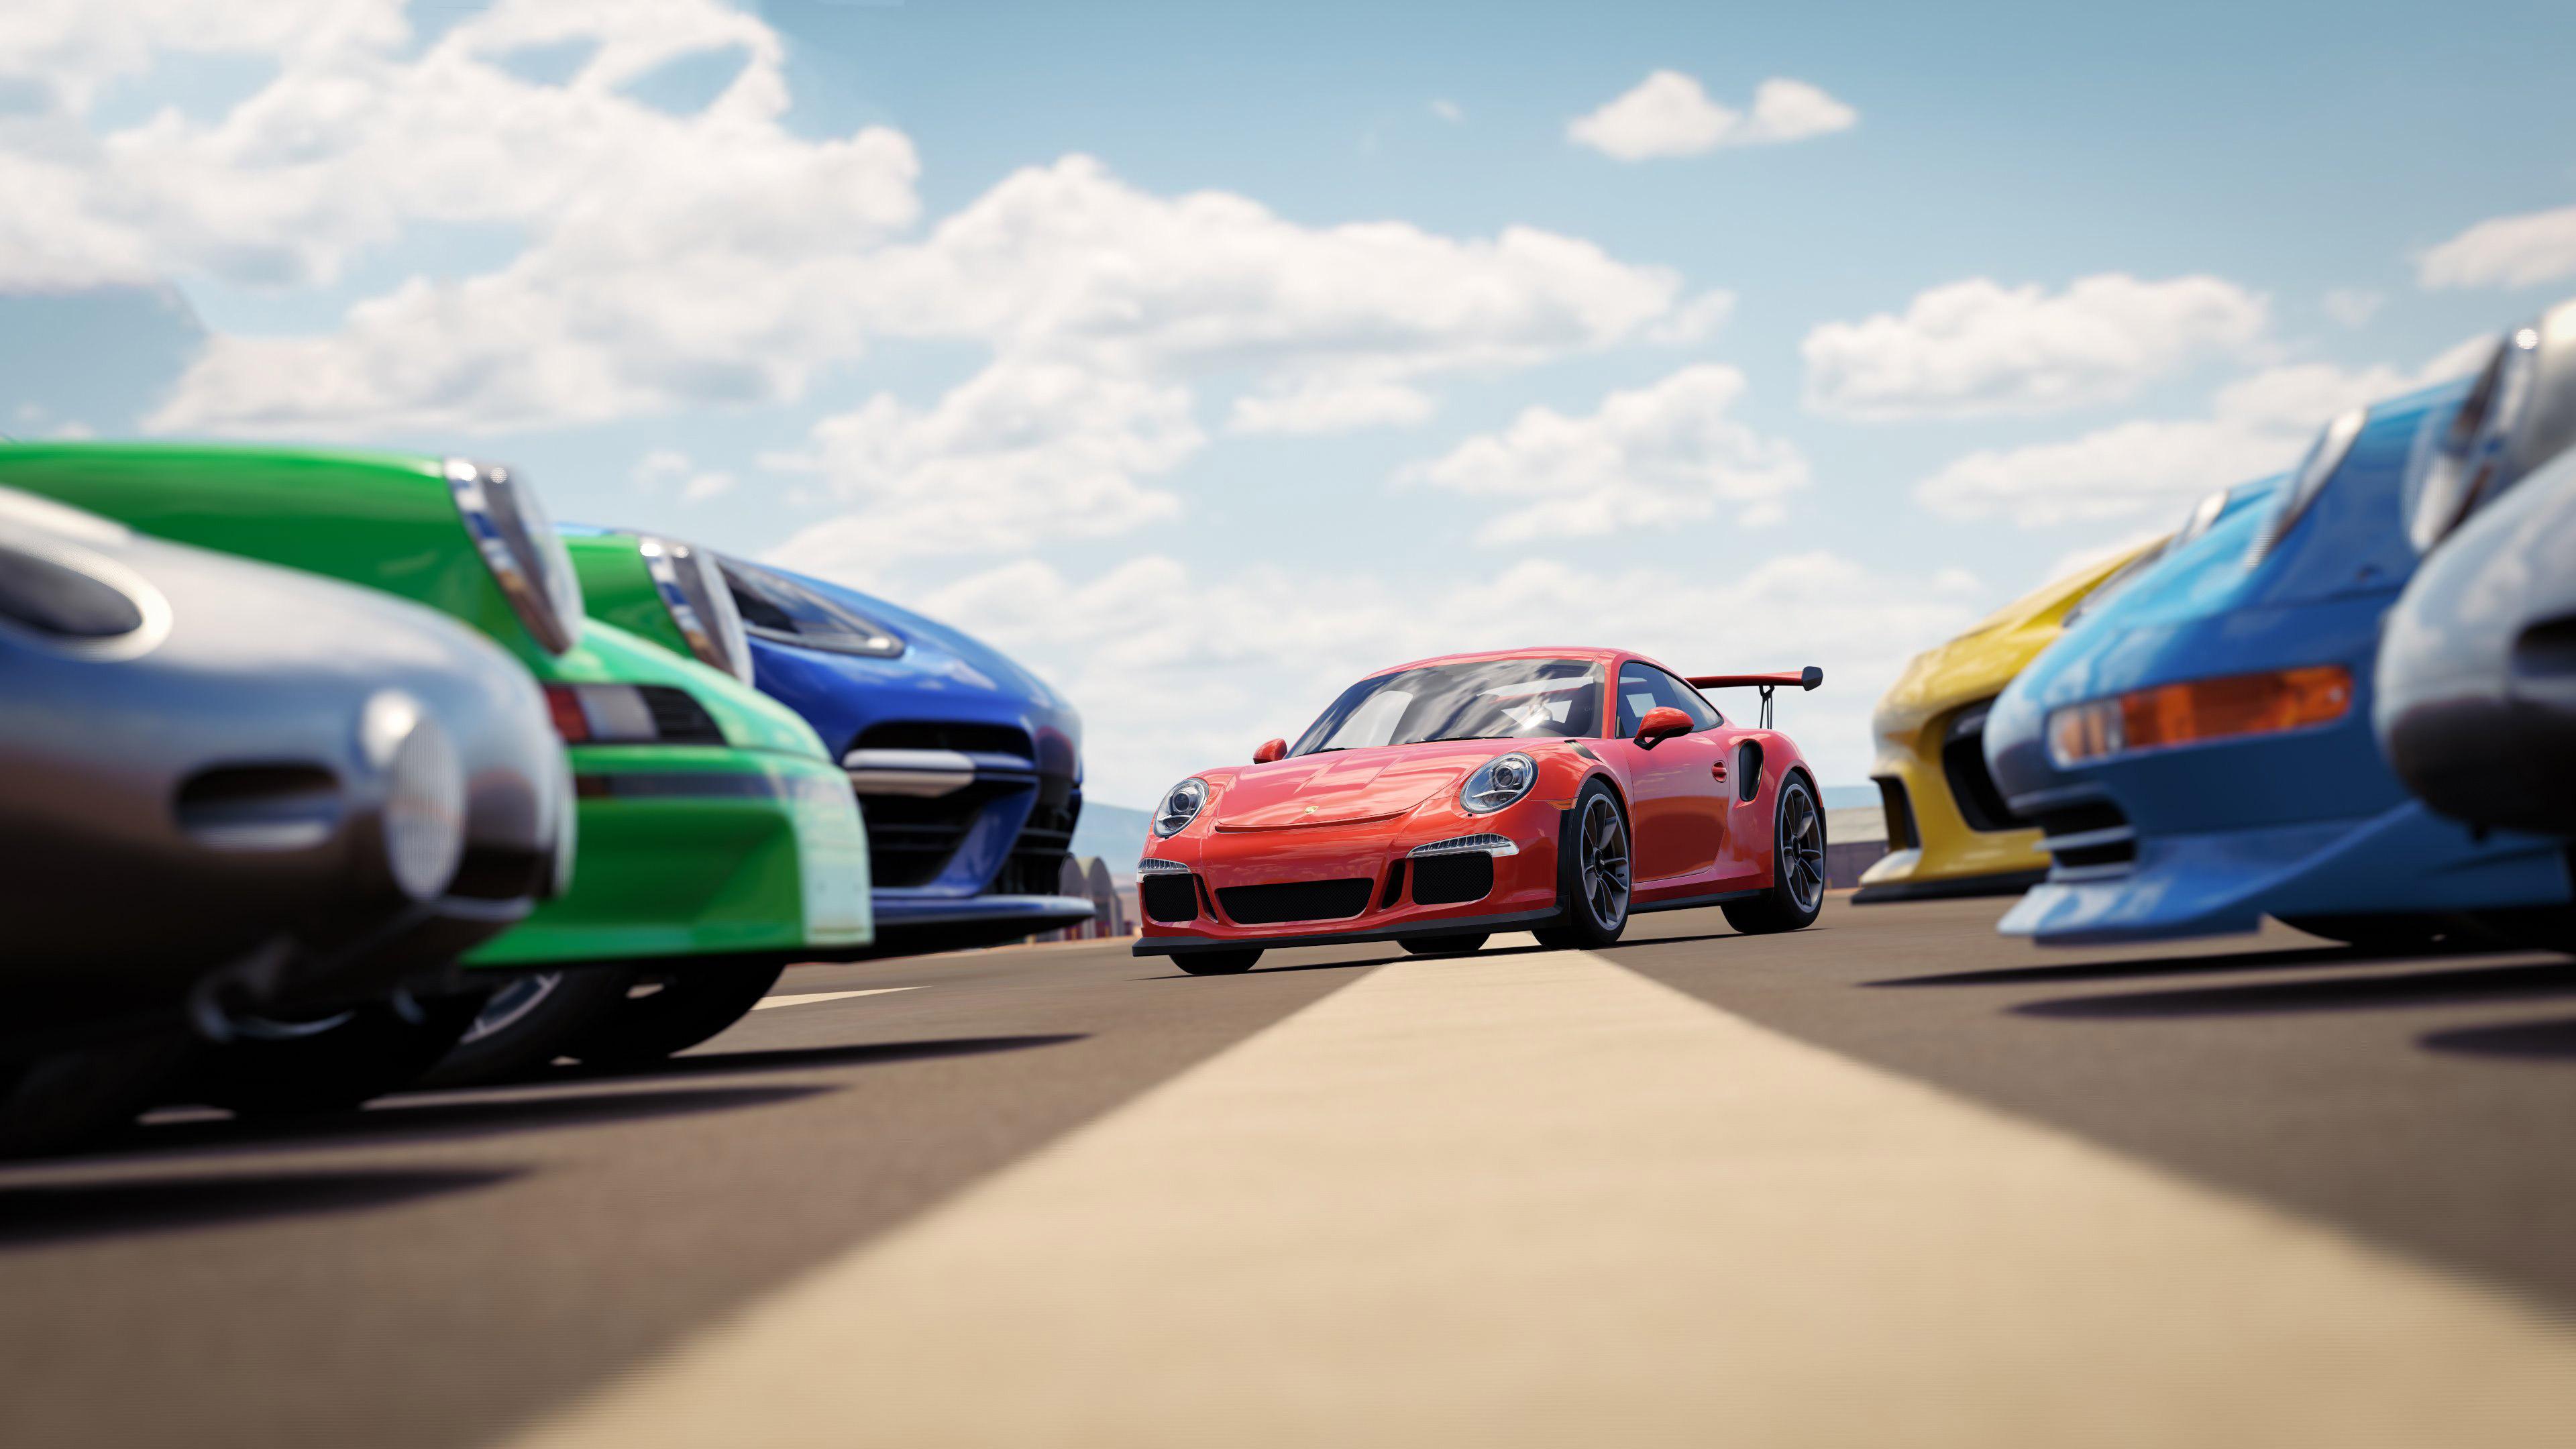 Forza Horizon 3 Background: Forza Horizon 3 2017, HD Games, 4k Wallpapers, Images